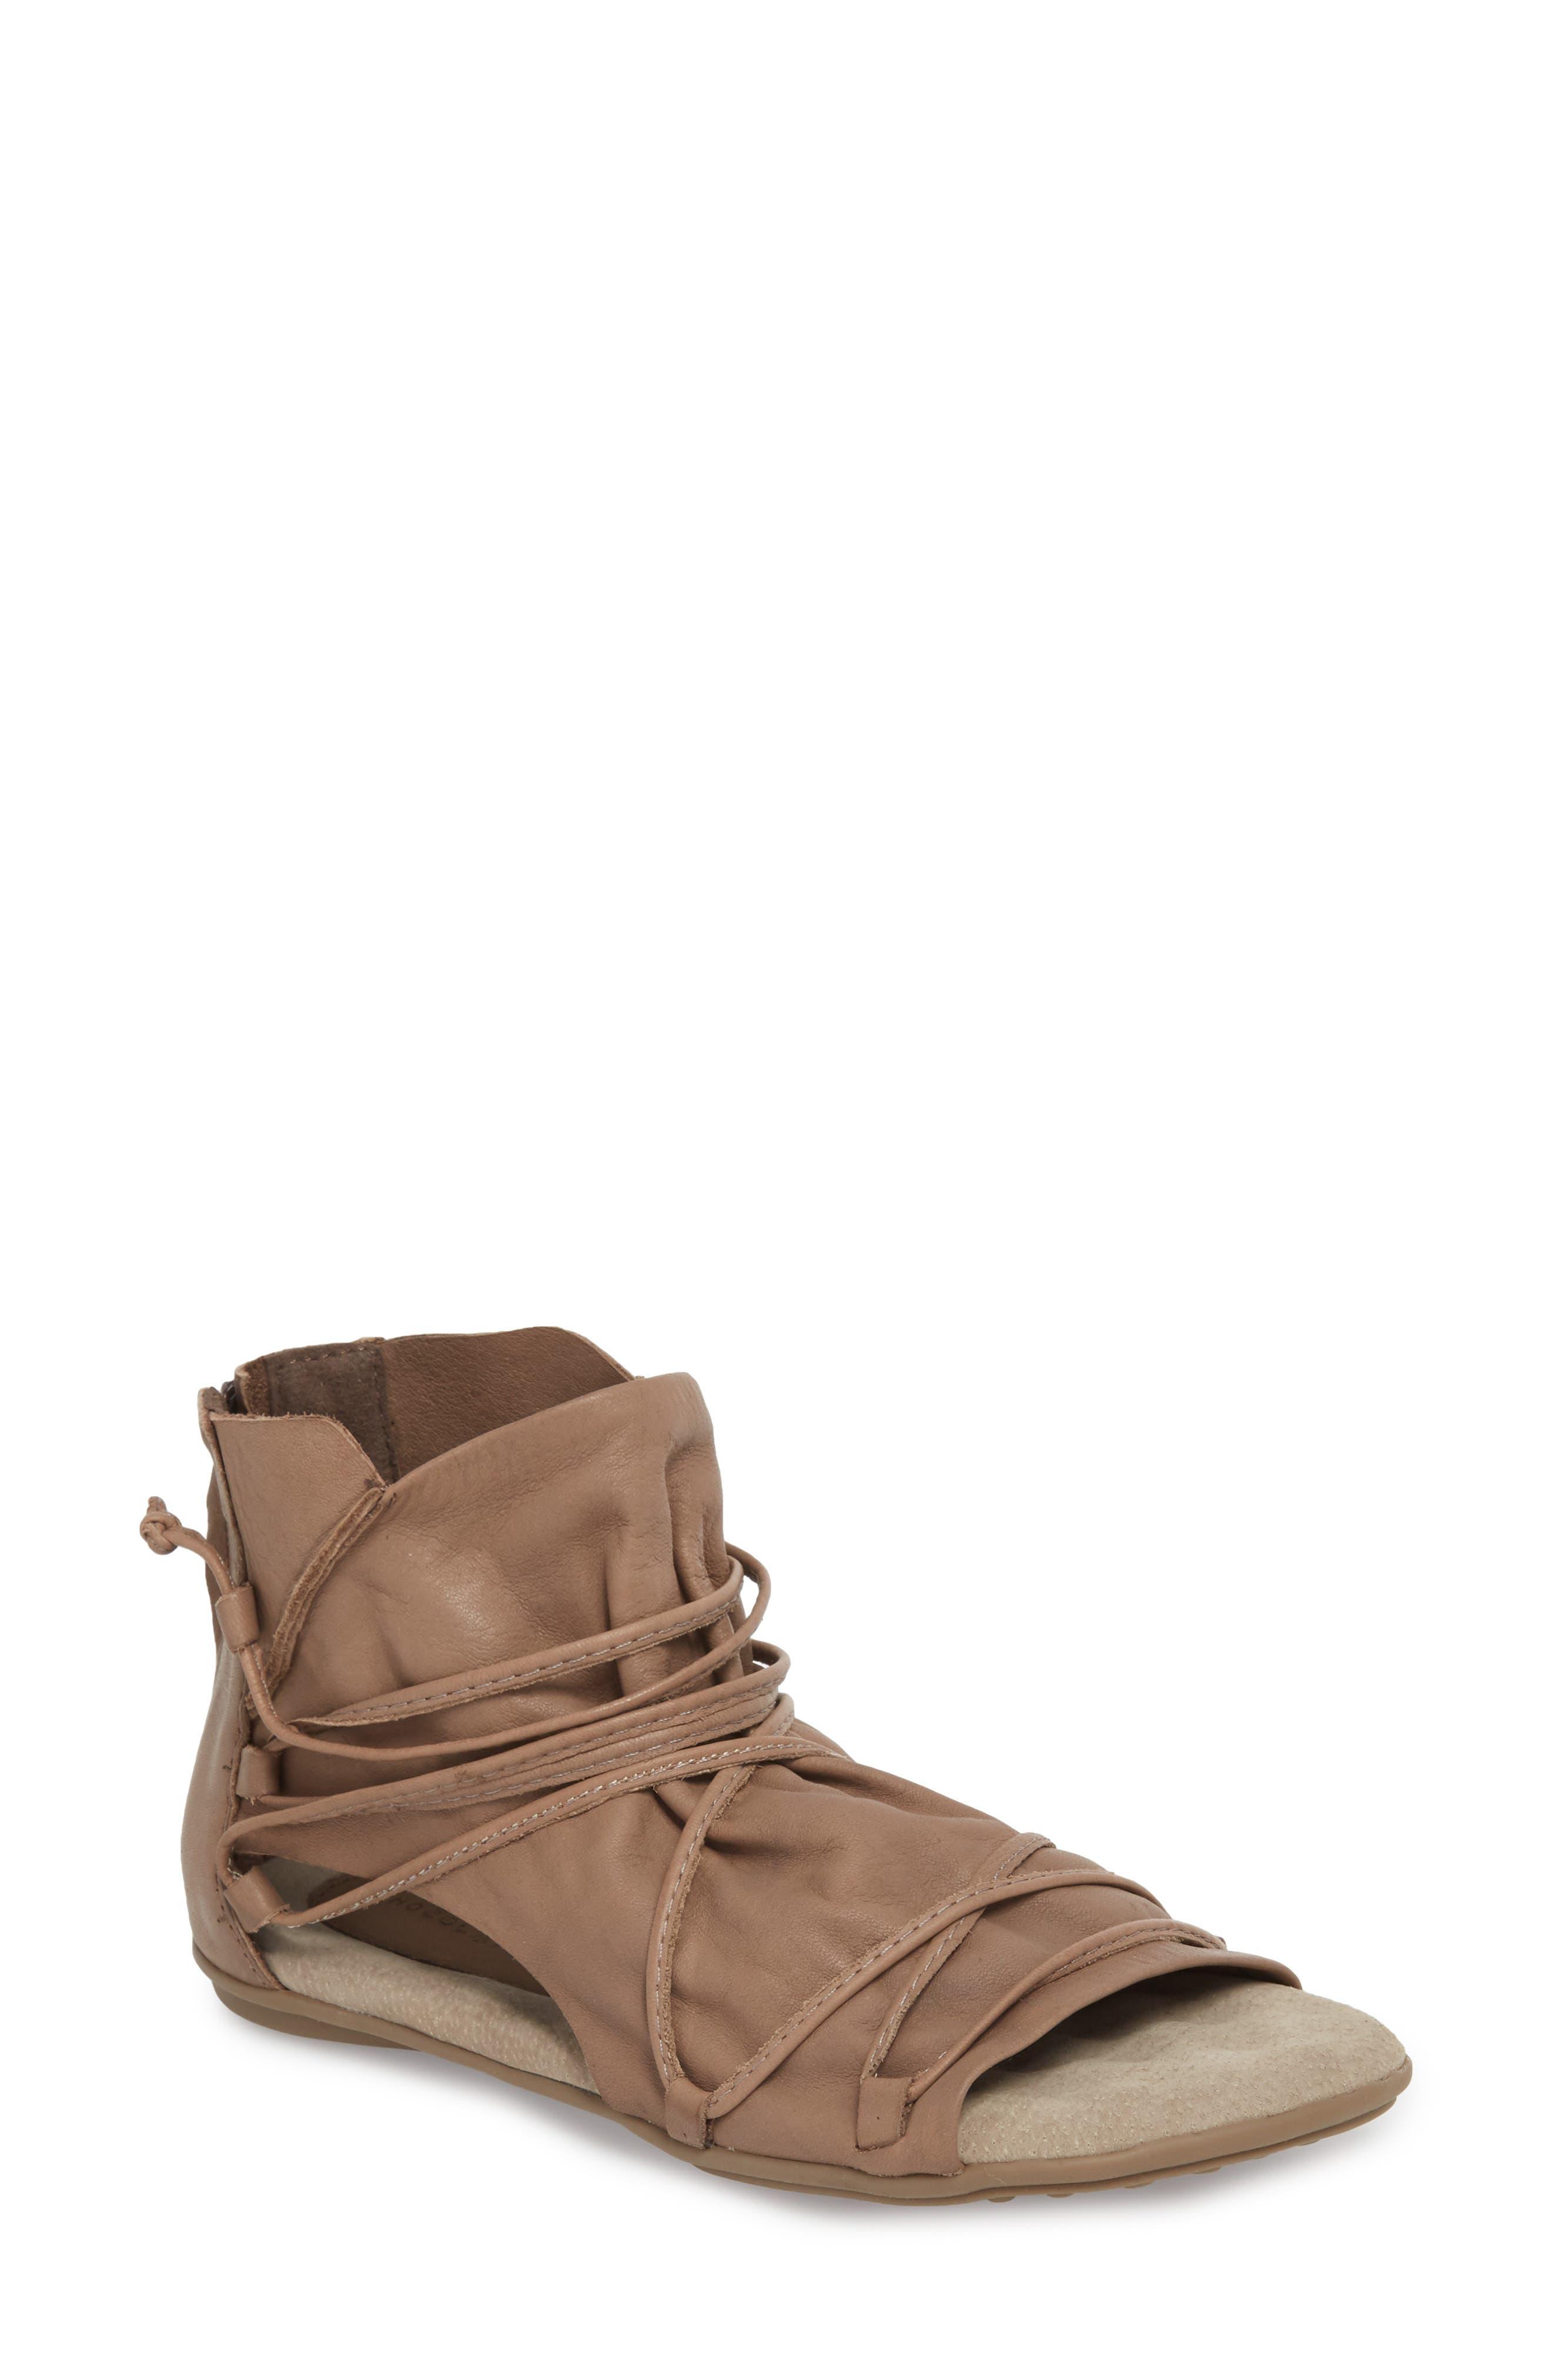 Byron Flat,                         Main,                         color, Khaki Leather